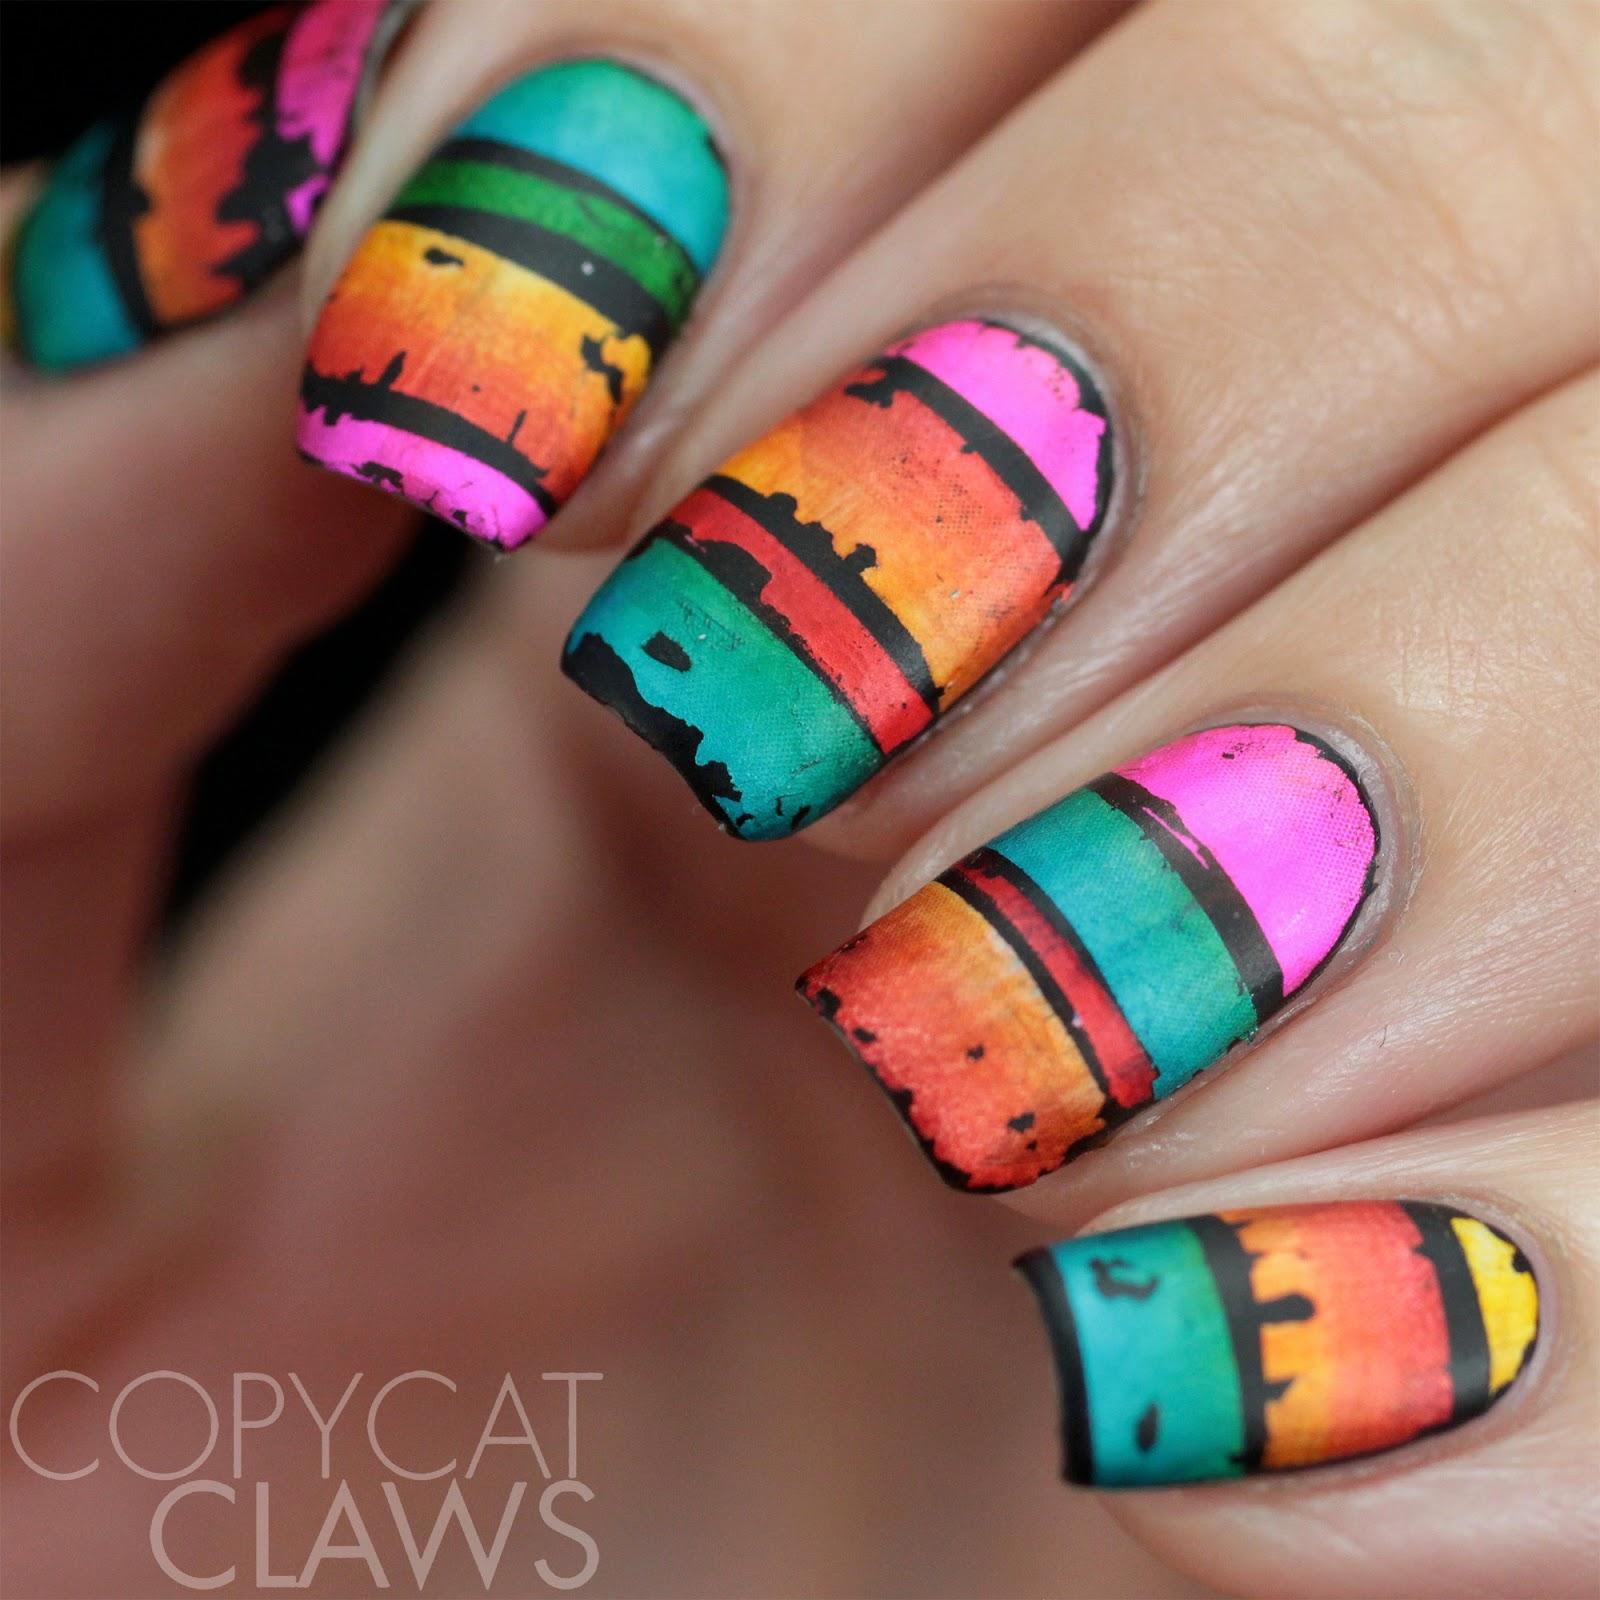 Copycat claws nail crazies unite stripes - Foil nail art ...